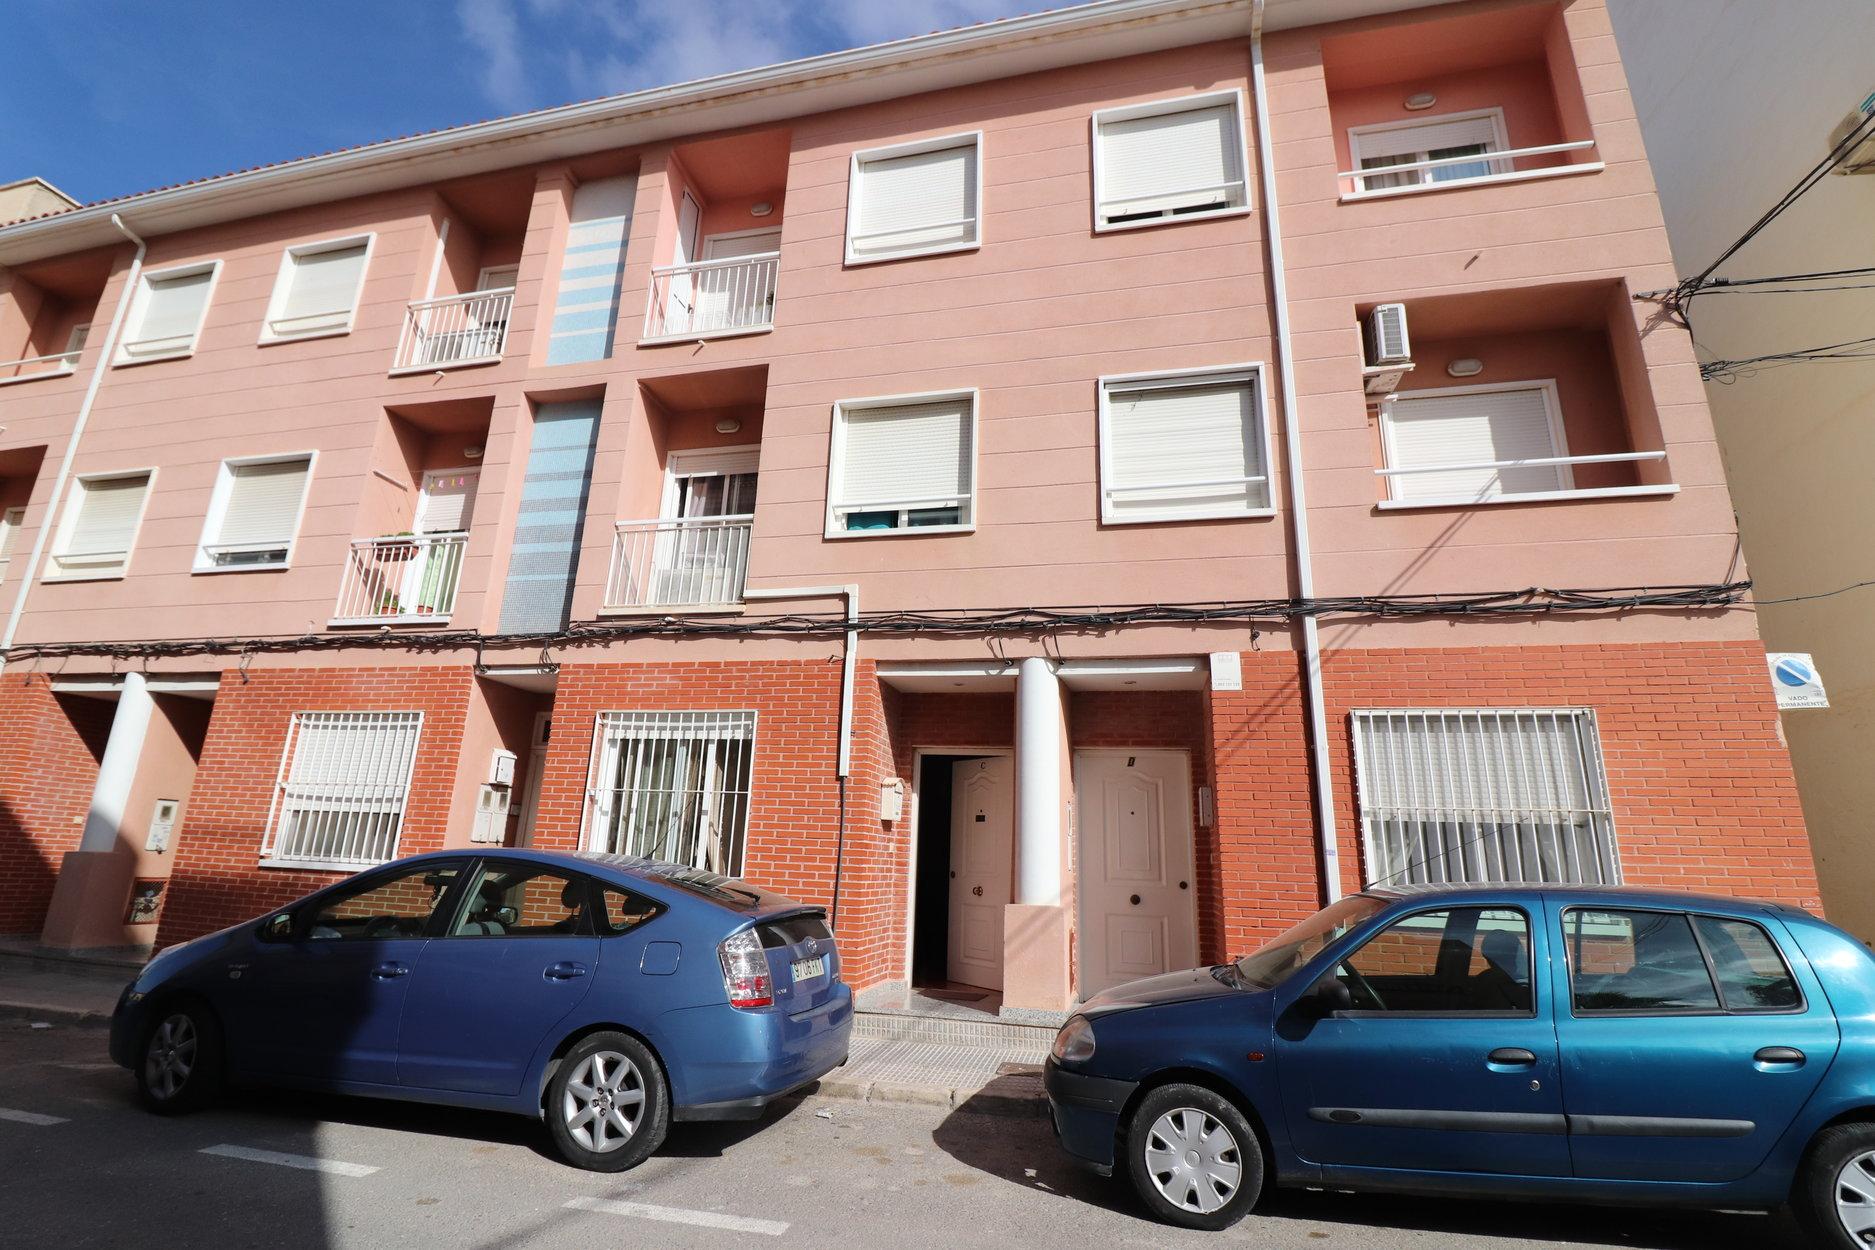 Town house for sale in Benijofar - Costa Blanca